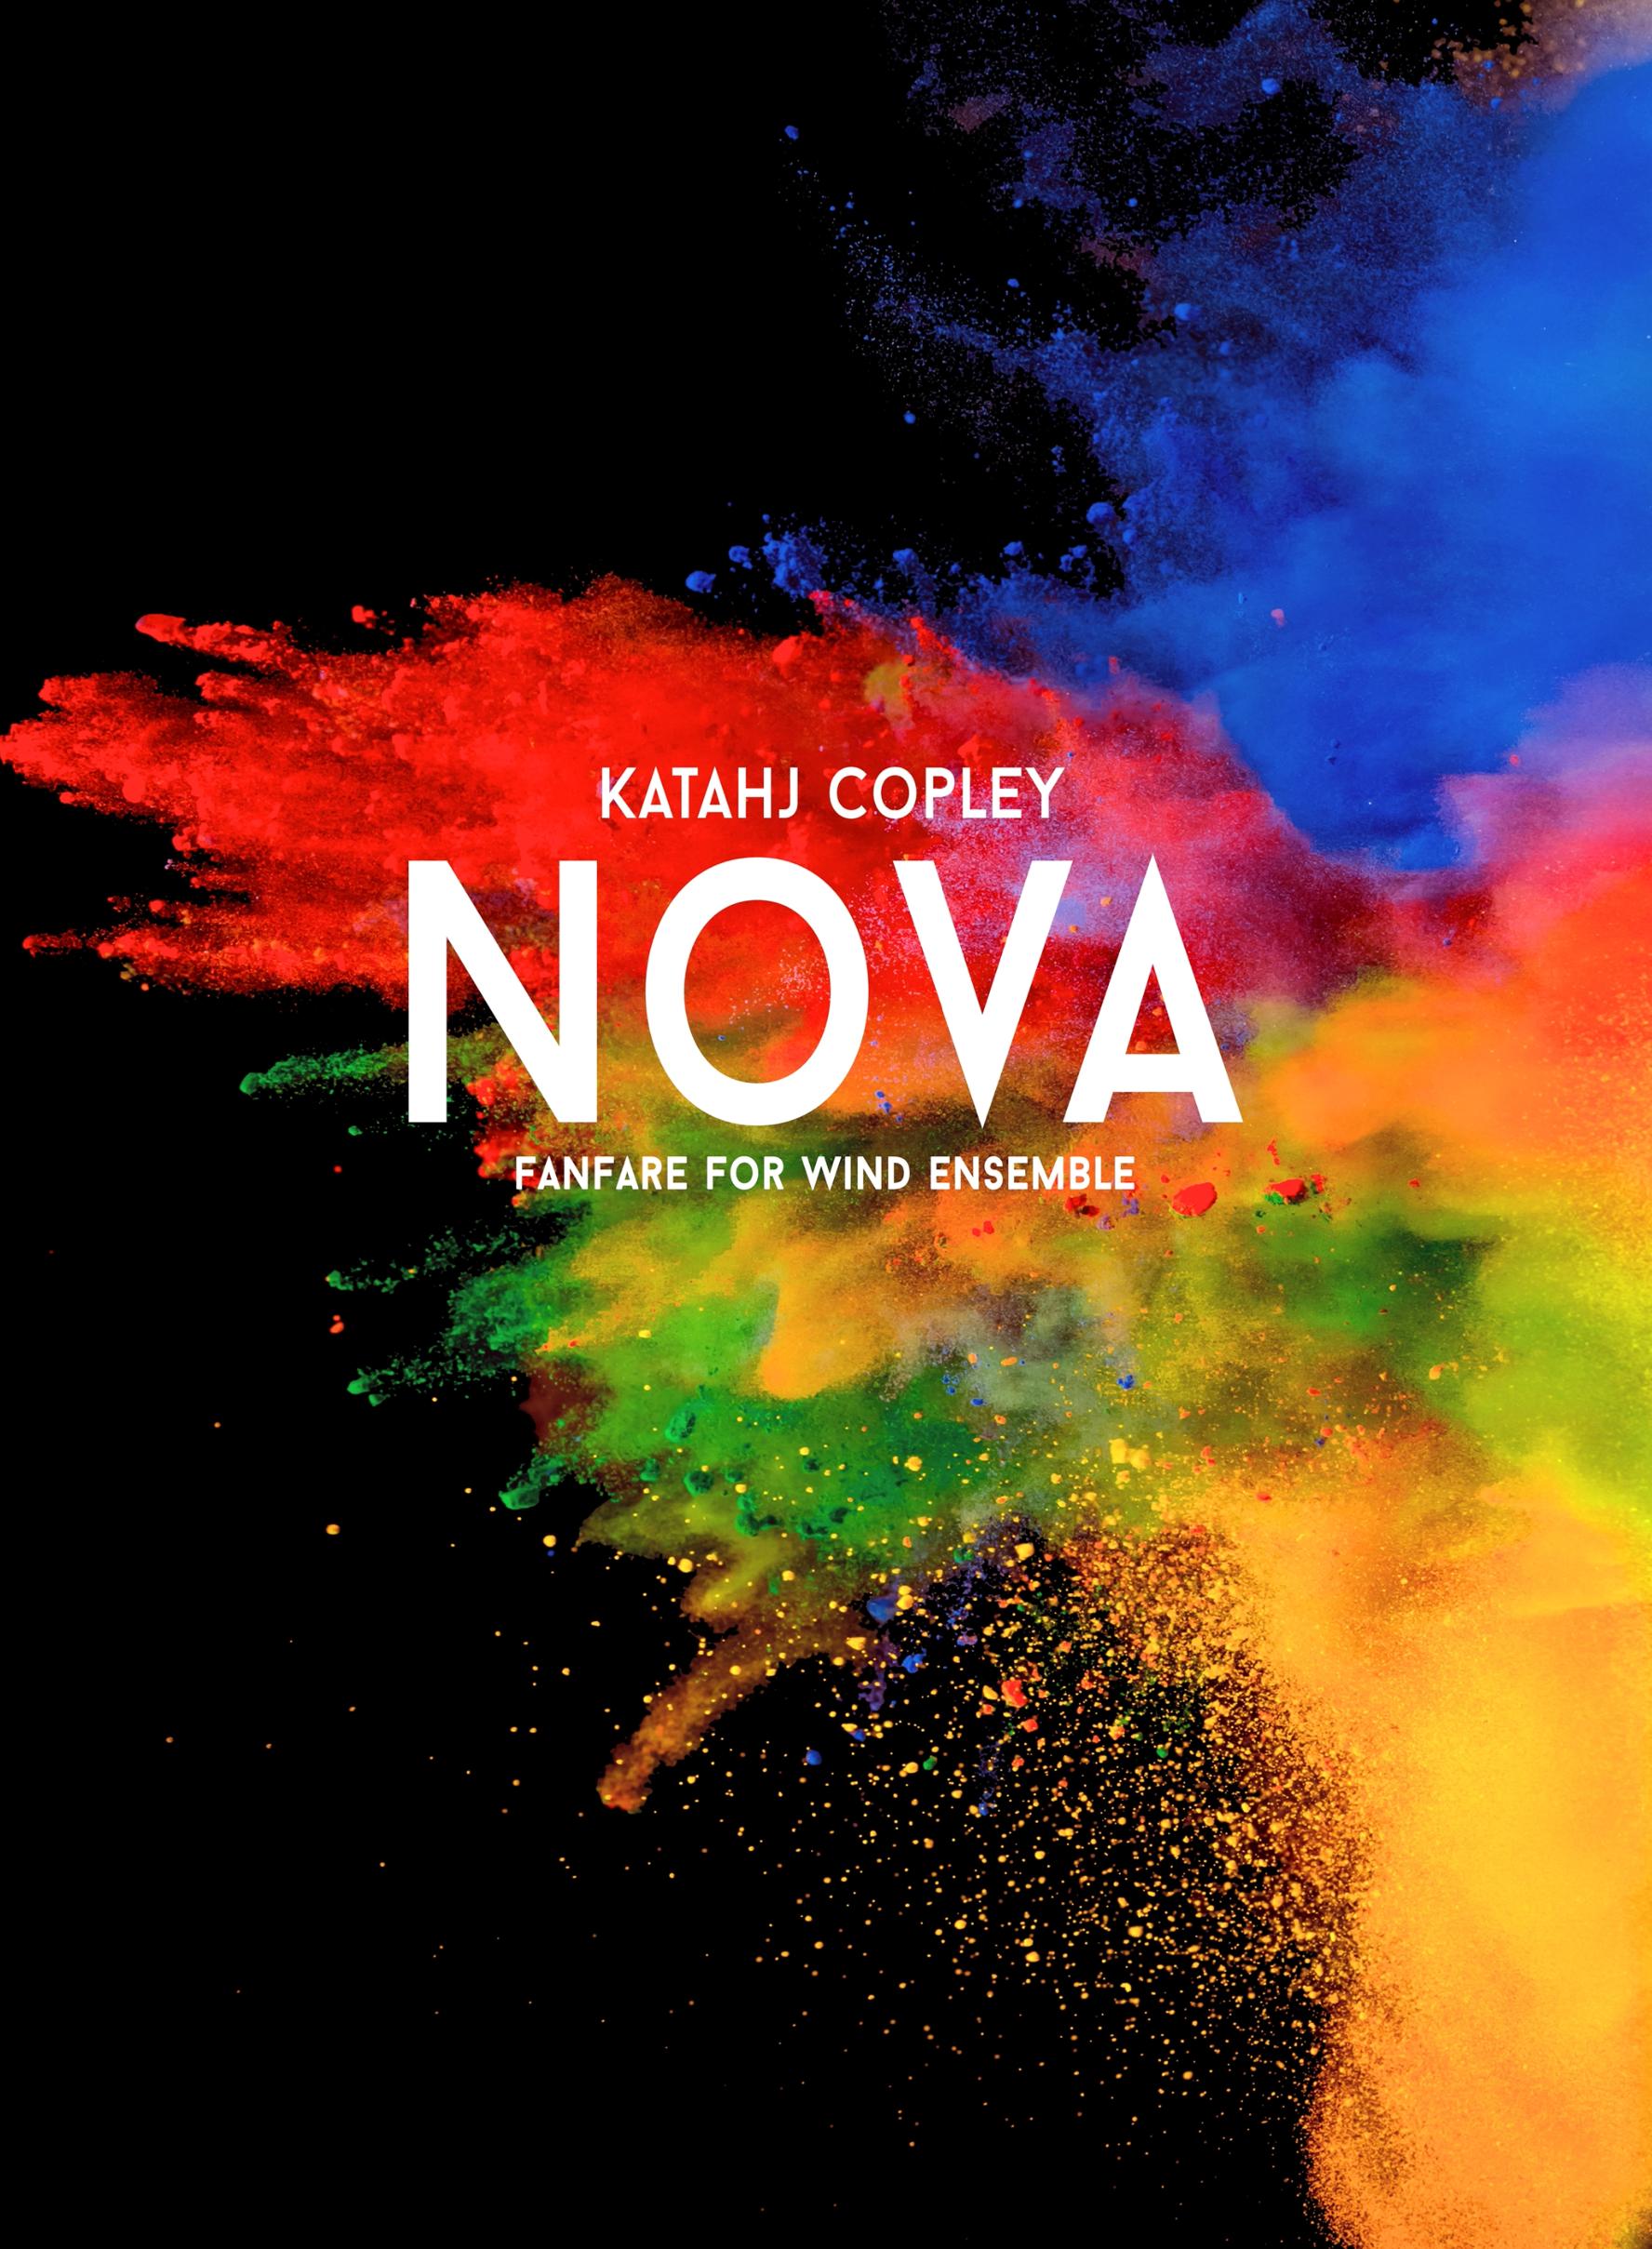 Nova (Score Only) by Katahj Copley